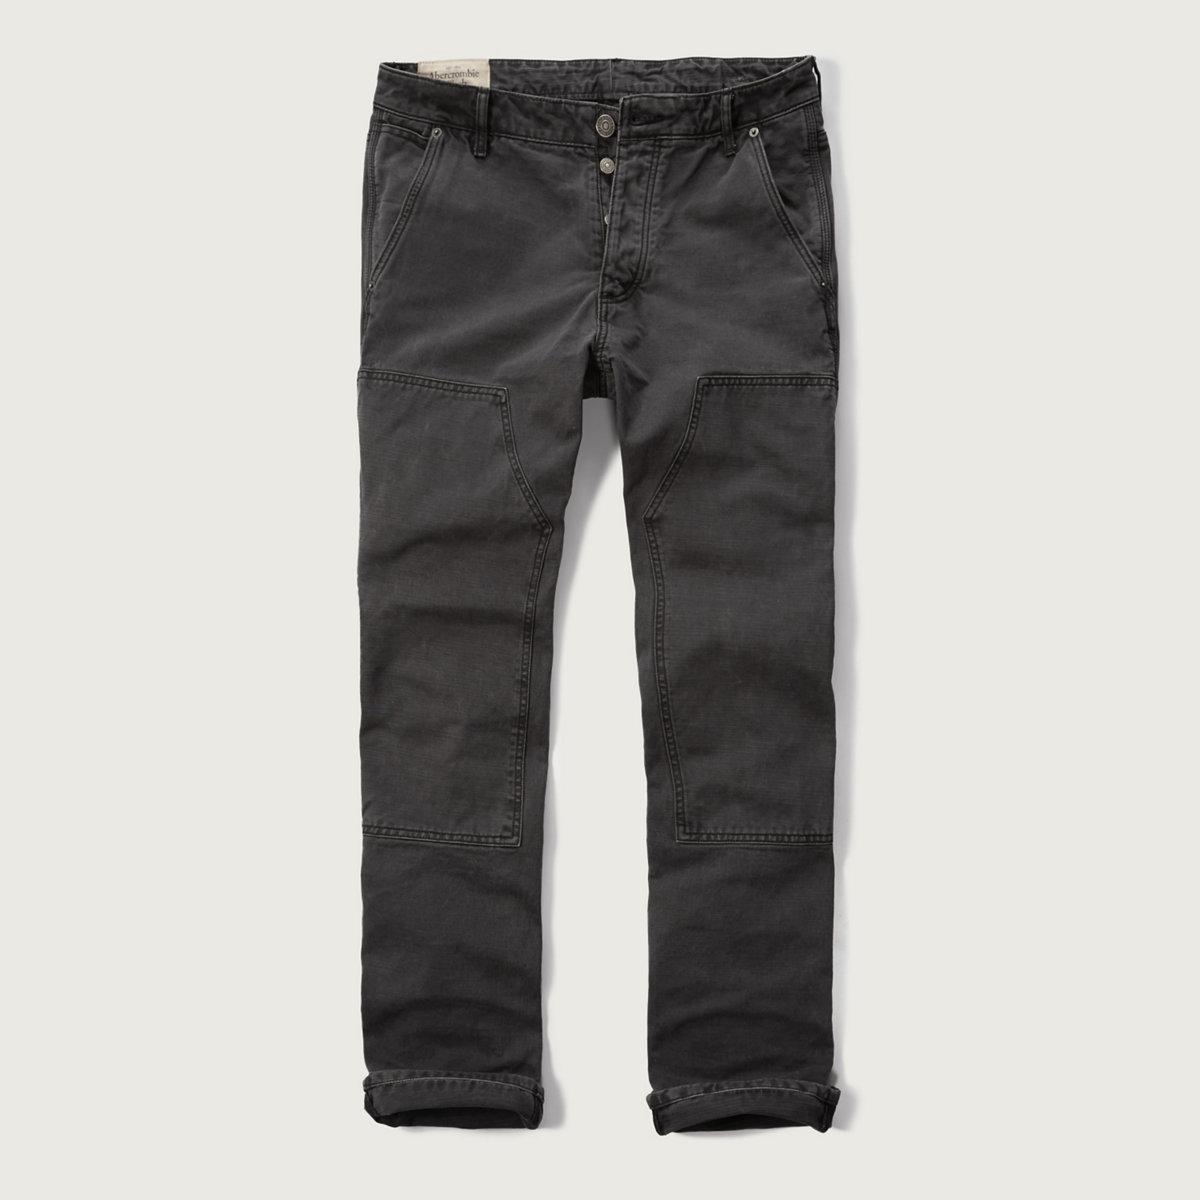 Washed Carpenter Chino Pants